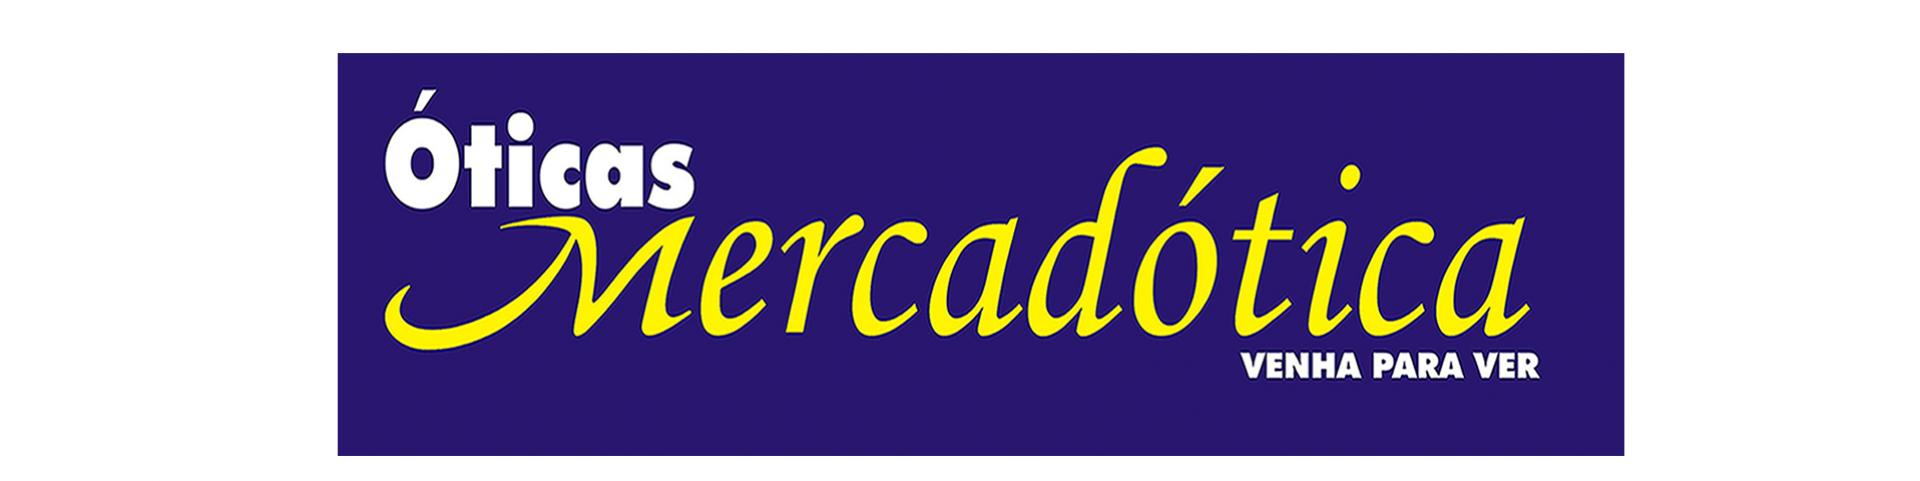 Loja - Óticas Mercadótica 4b7f164892